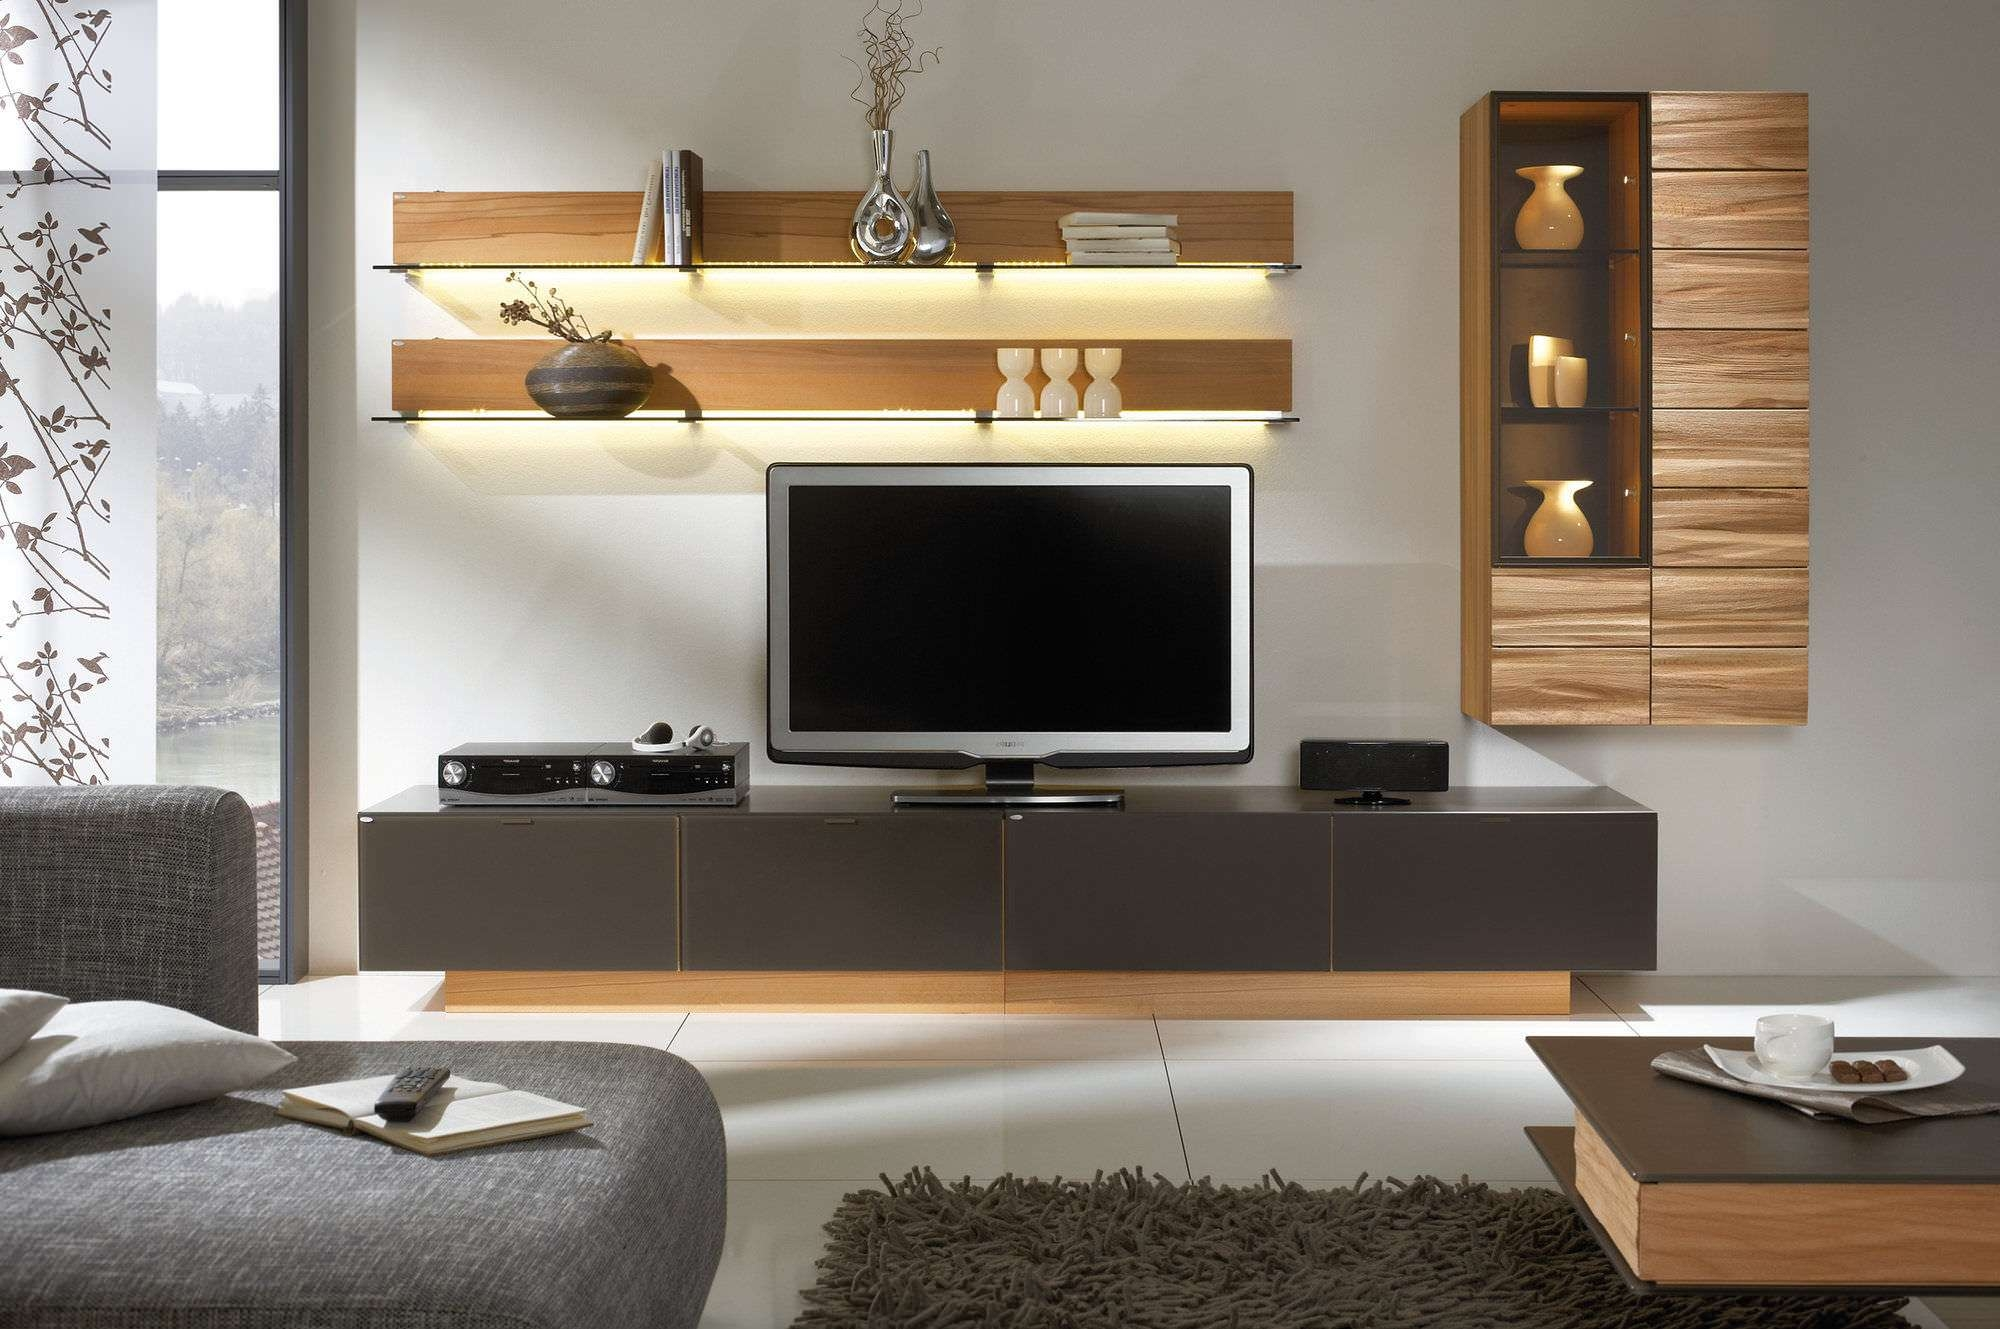 Bedroom : Tv Stand Modern Tv Cabinet Tv Shelf Unit Tv Cabinet Intended For Modern Tv Cabinets (View 15 of 20)